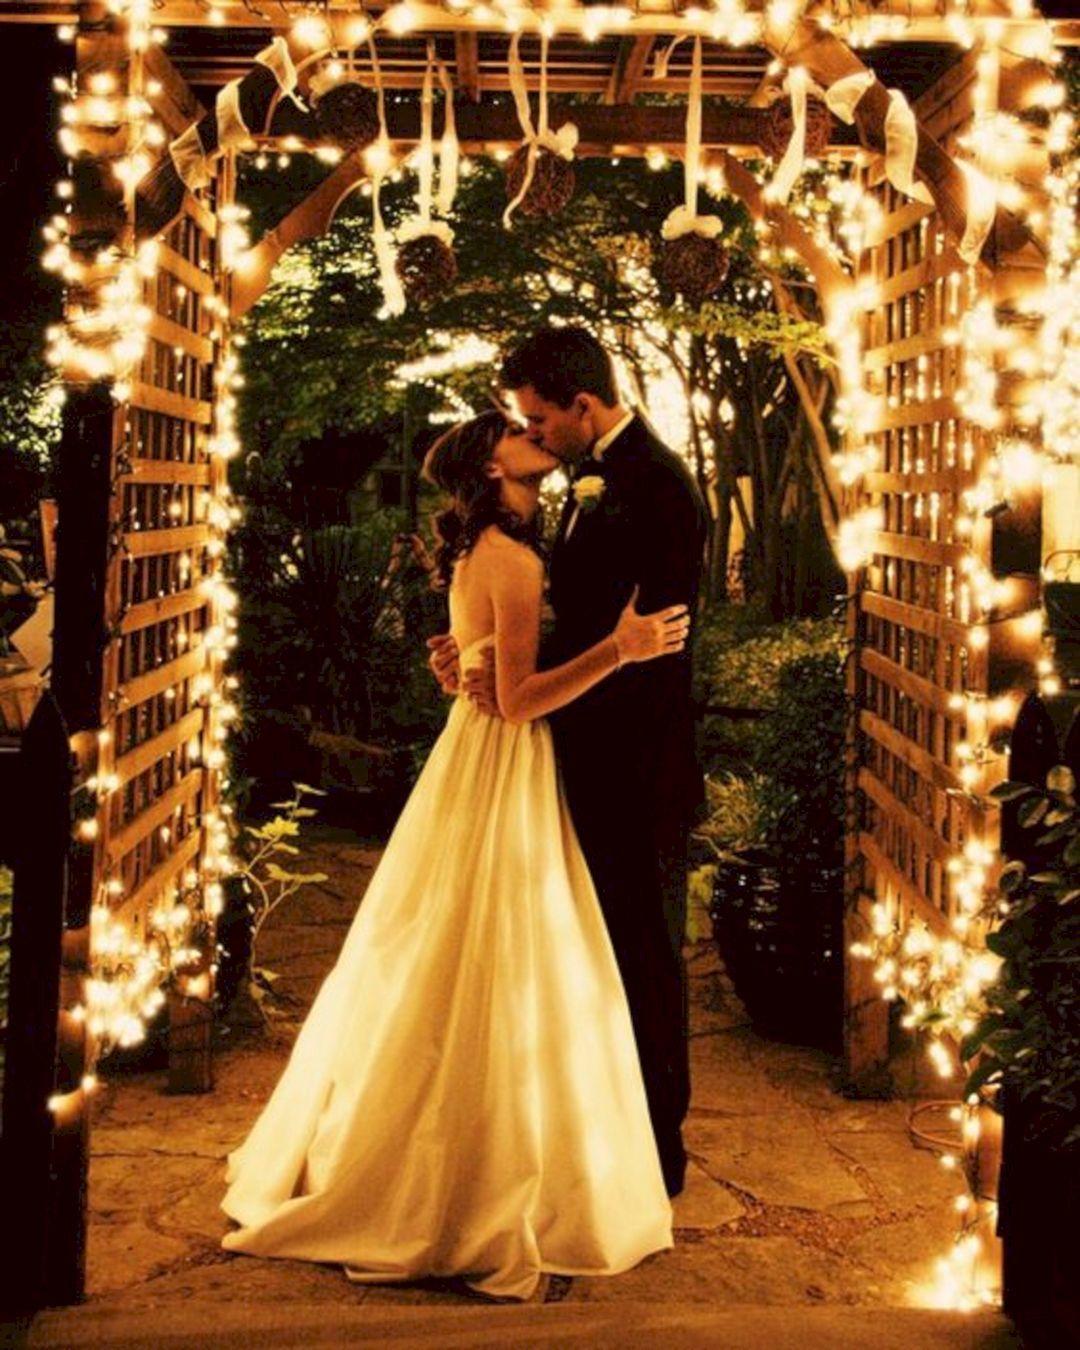 Night Beach Wedding Ceremony Ideas: 25 Outdoor Night Wedding Ceremony For Romantic Wedding